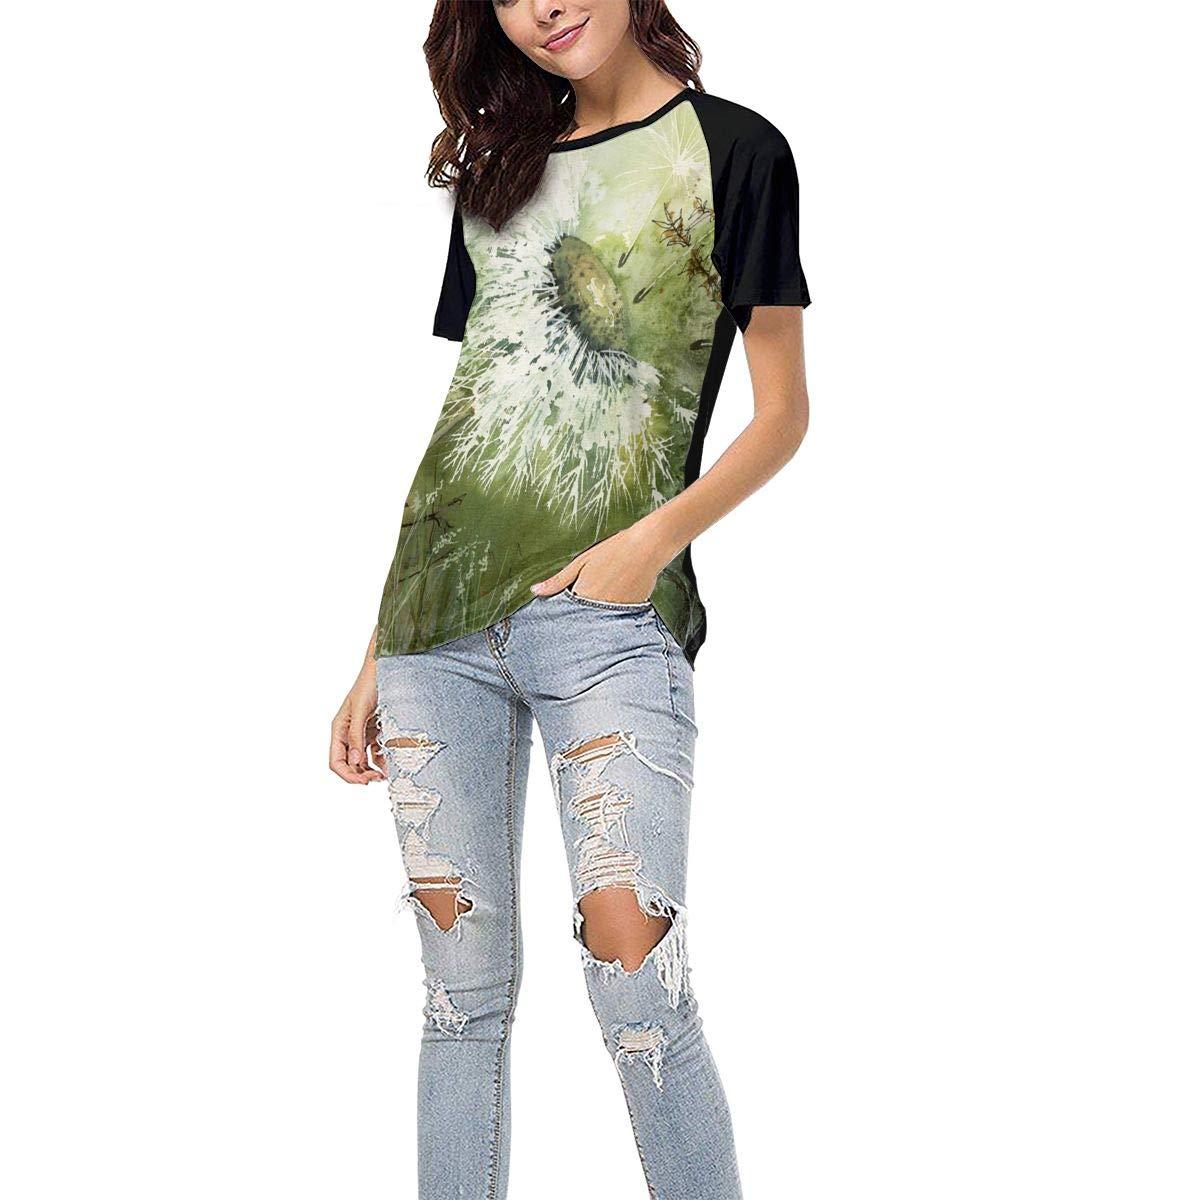 Dandelion Clock Casual Raglan Tee Baseball Tshirts Tops Blouse Womens Summer Short Sleeve